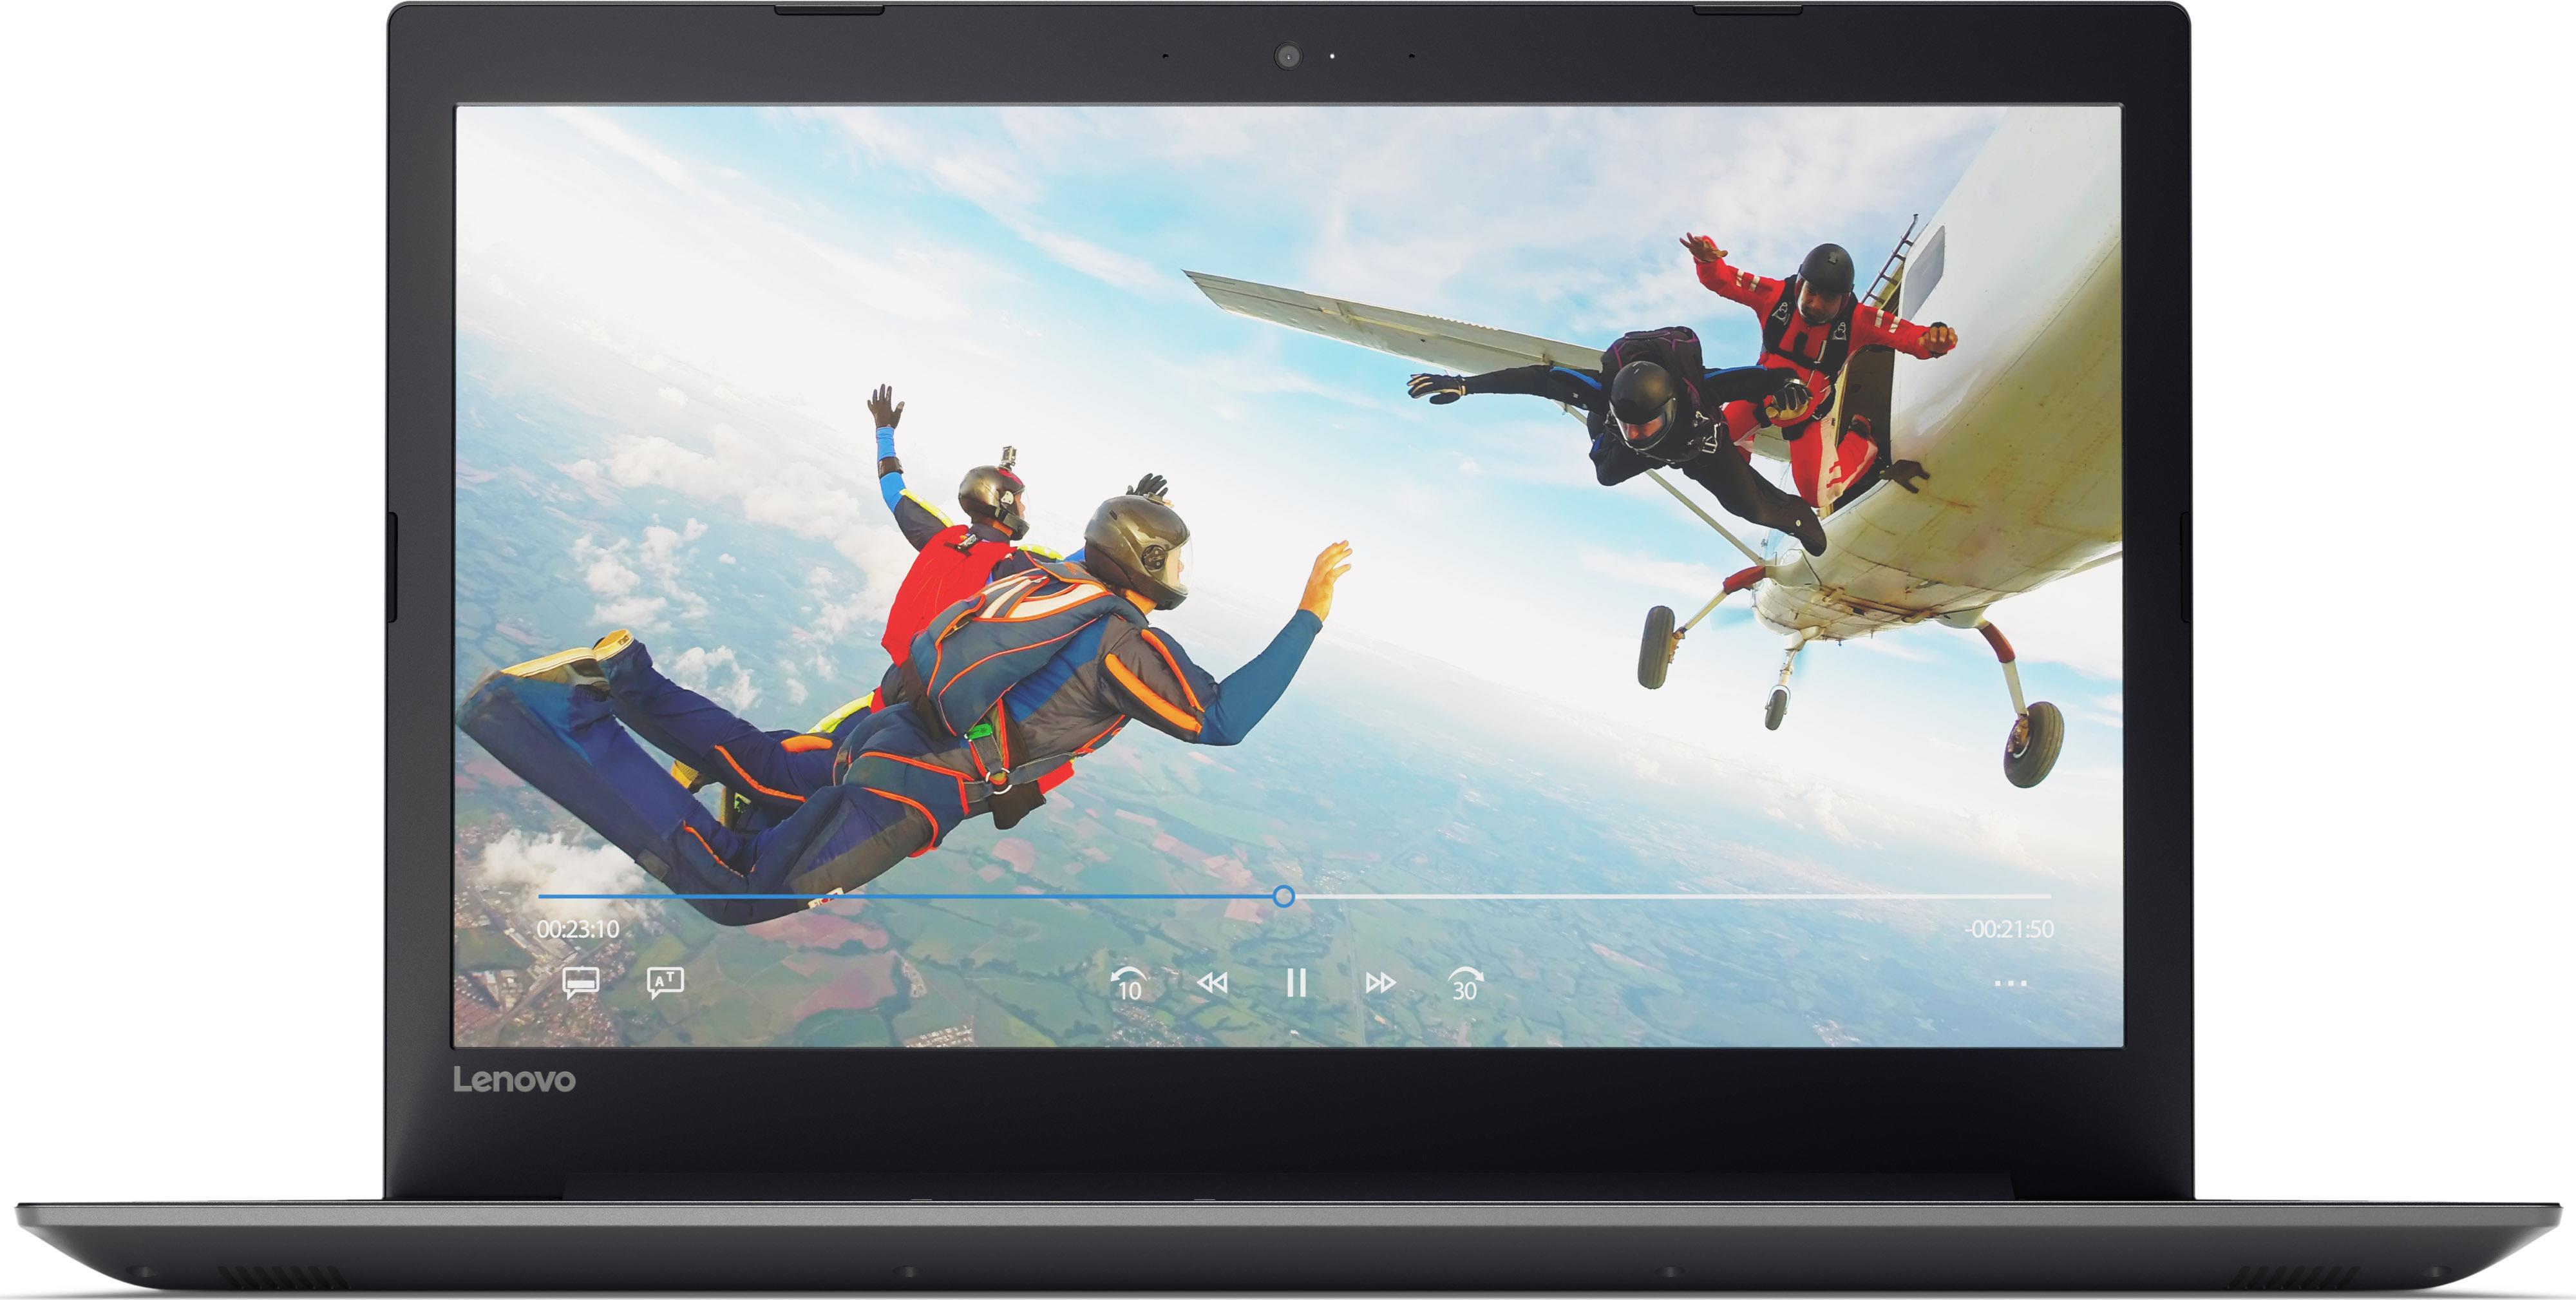 Notebooks, Laptops - Lenovo 320 17AST 80XW A9 9420 3 GHz Win 10 Home 64 Bit 8 GB RAM 256 GB SSD DVD Writer 43.9 cm (17.3) TN 1600 x 900 (HD ) Radeon R5 Wi Fi, Bluetooth Onyx Black  - Onlineshop JACOB Elektronik